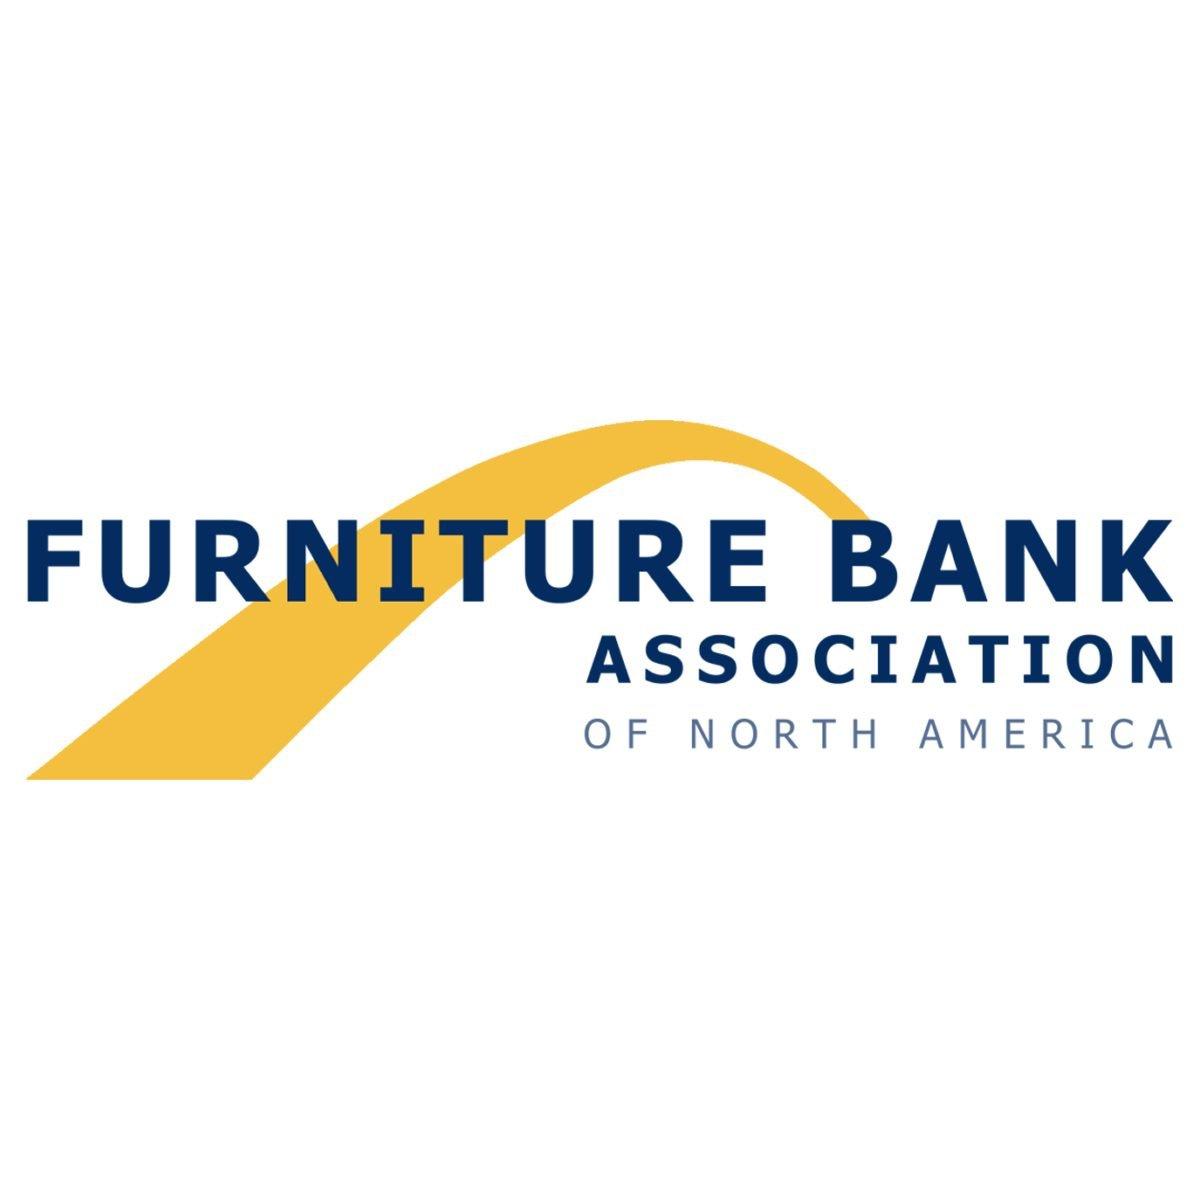 The National Furniture Bank Association